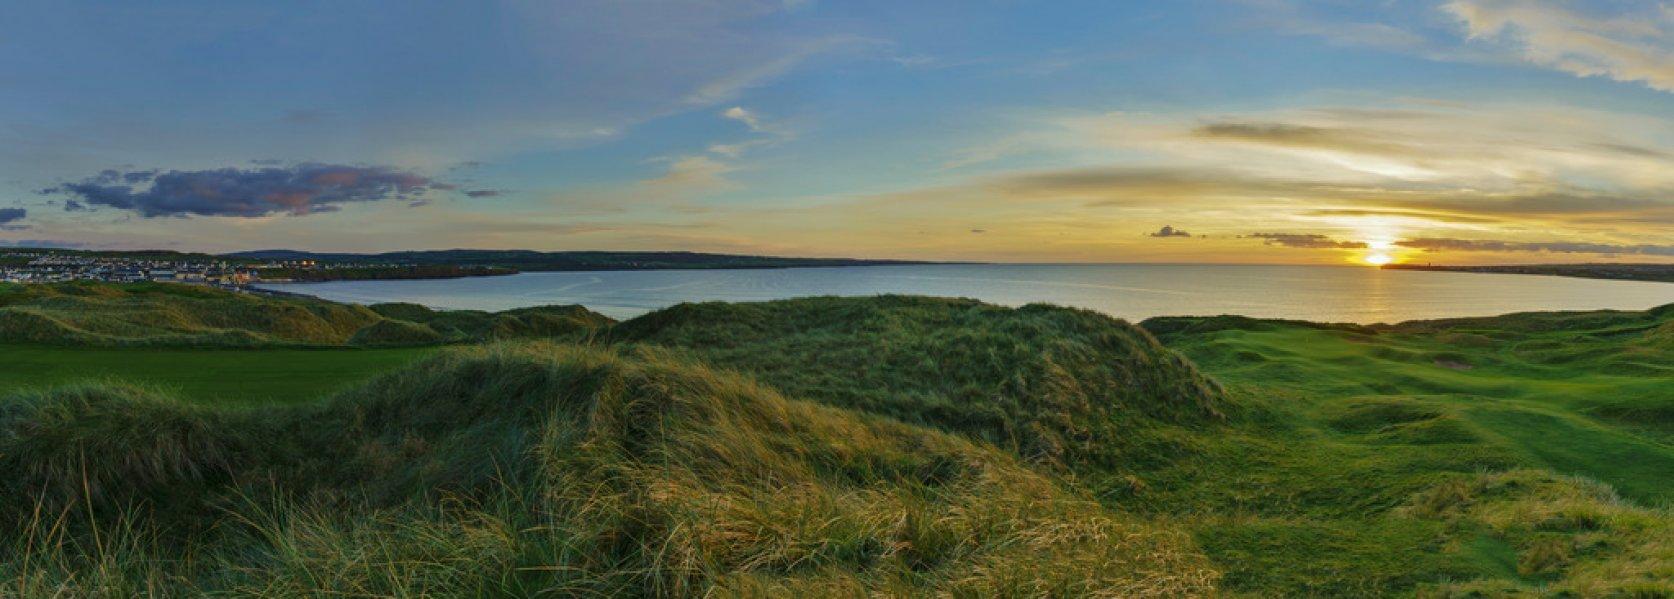 Surf Coast: Wild Atlantic Way Trip Ideas | potteriespowertransmission.co.uk